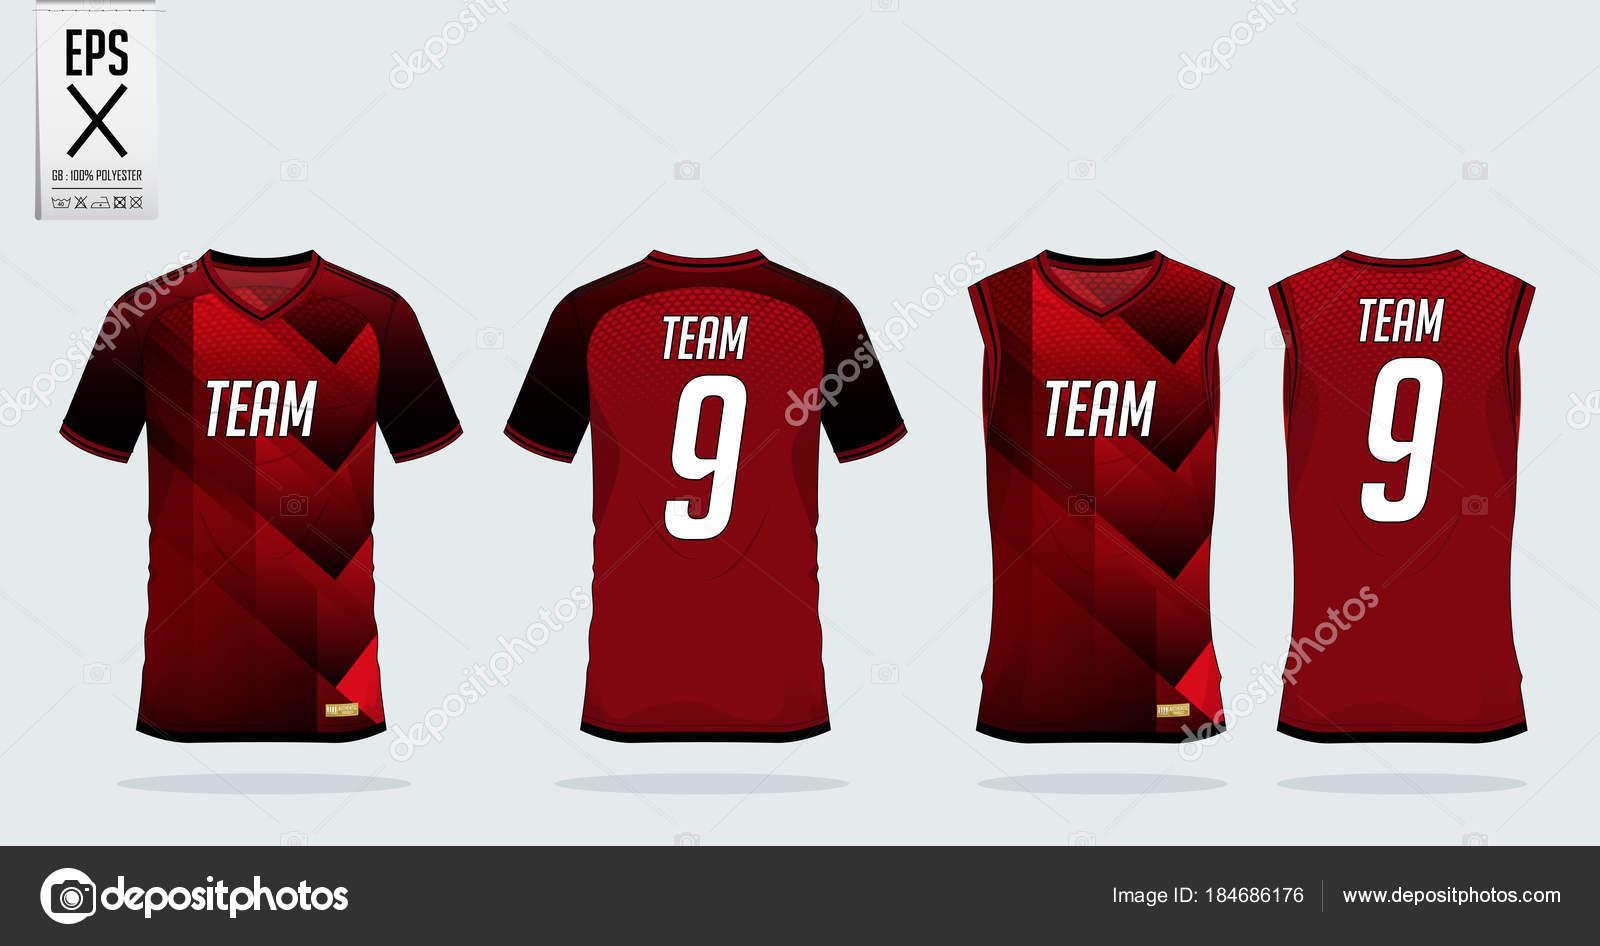 d98b6d5fed8 Red-black t-shirt sport design template for soccer jersey